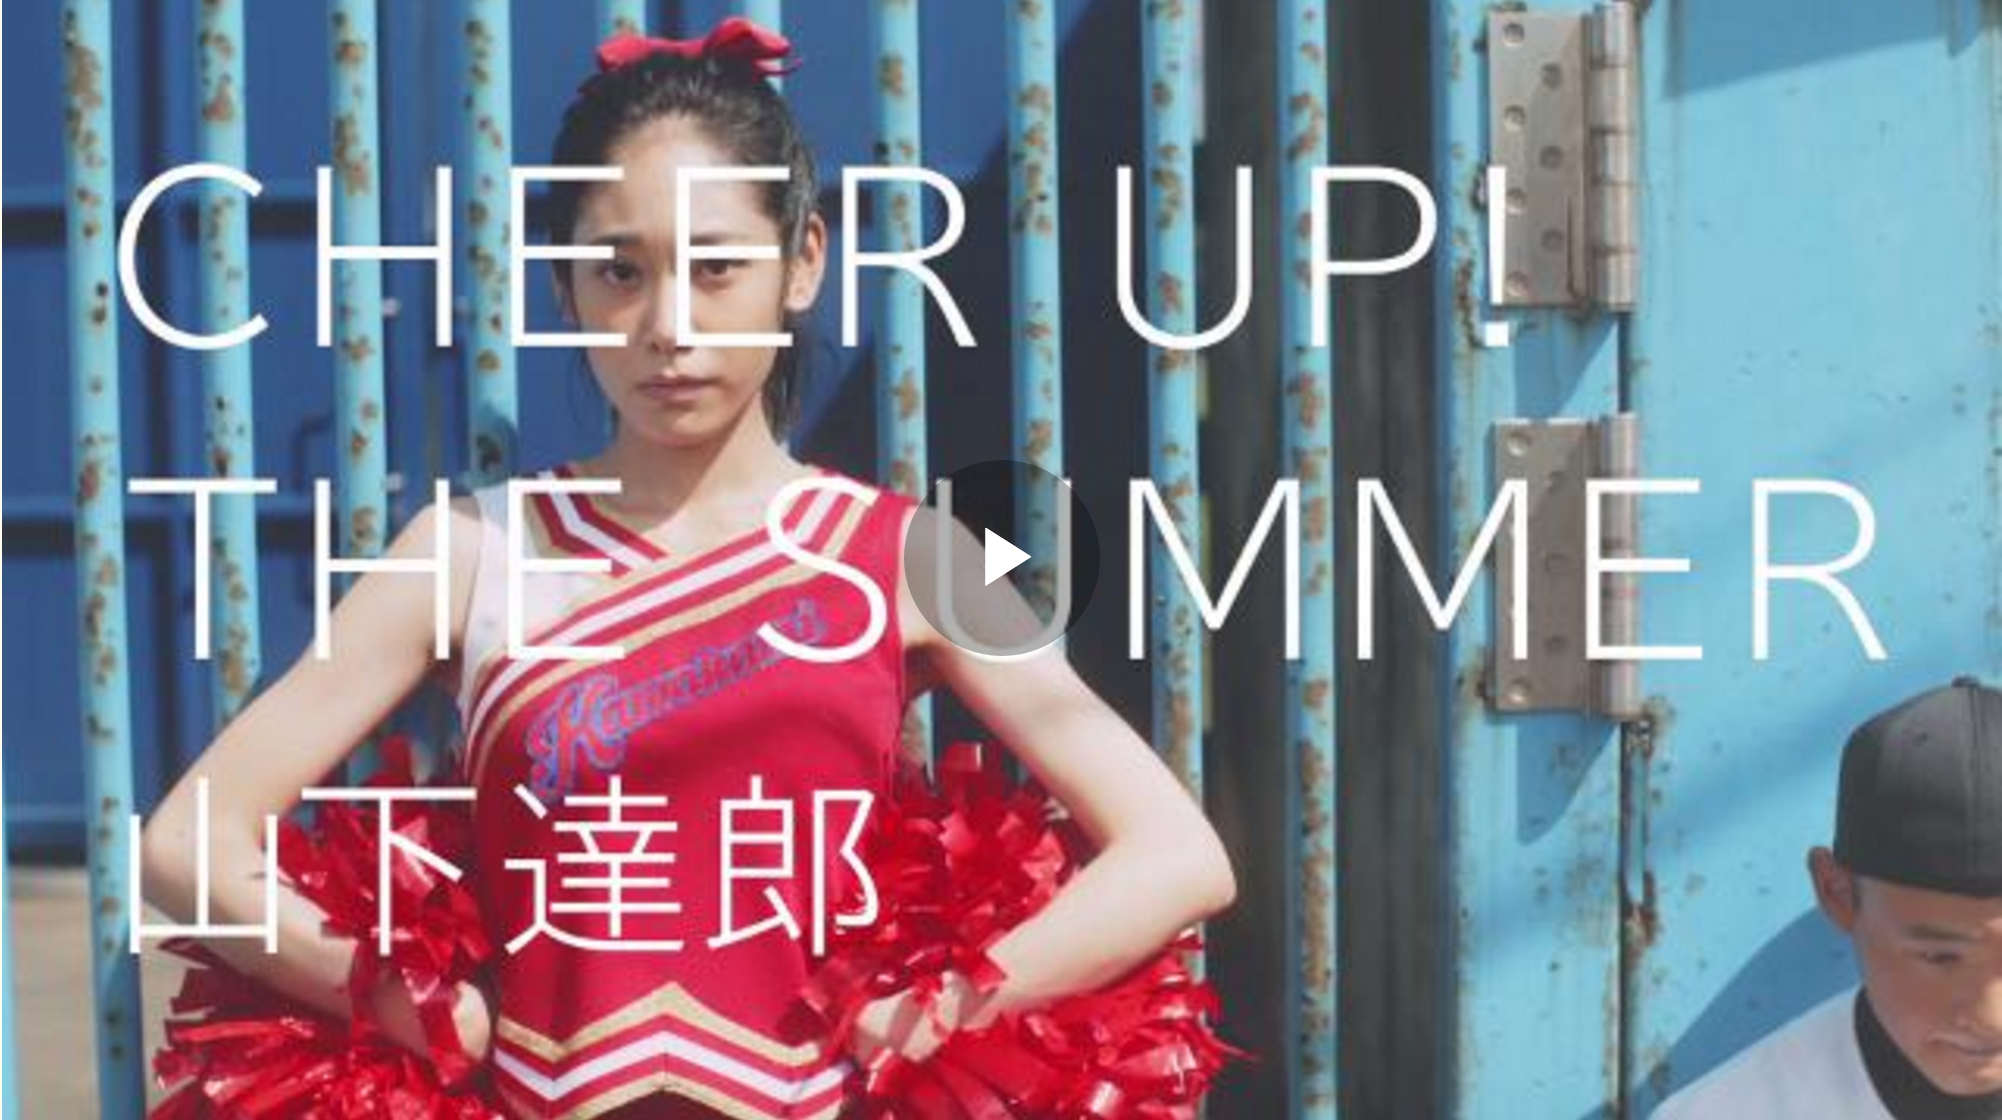 CHEER UP!THE SUMMERのMVに出演しているチアガールの女の子は誰?